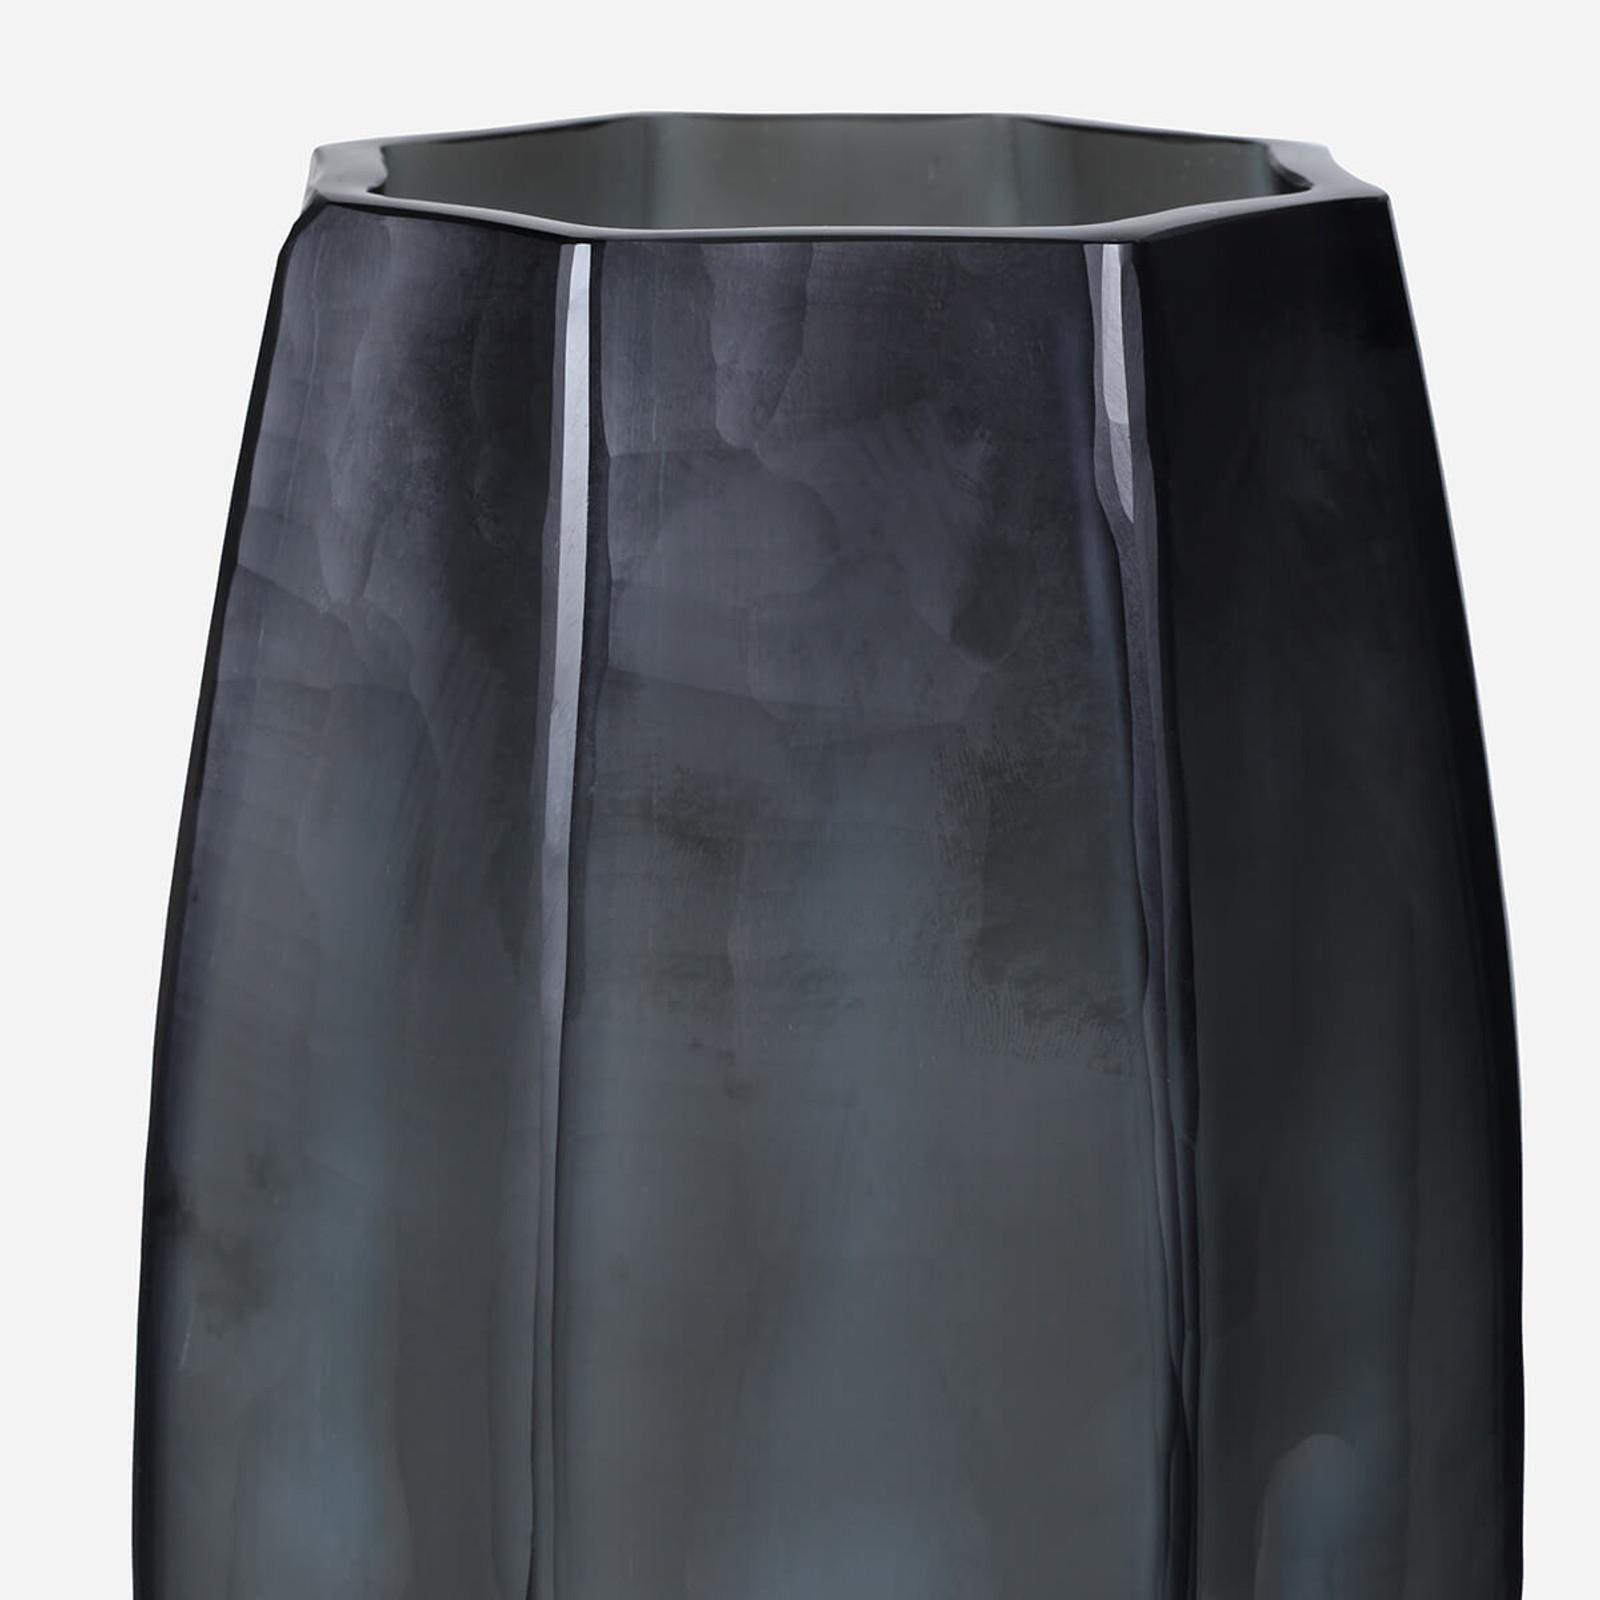 Loire Tall Vase, Indigo